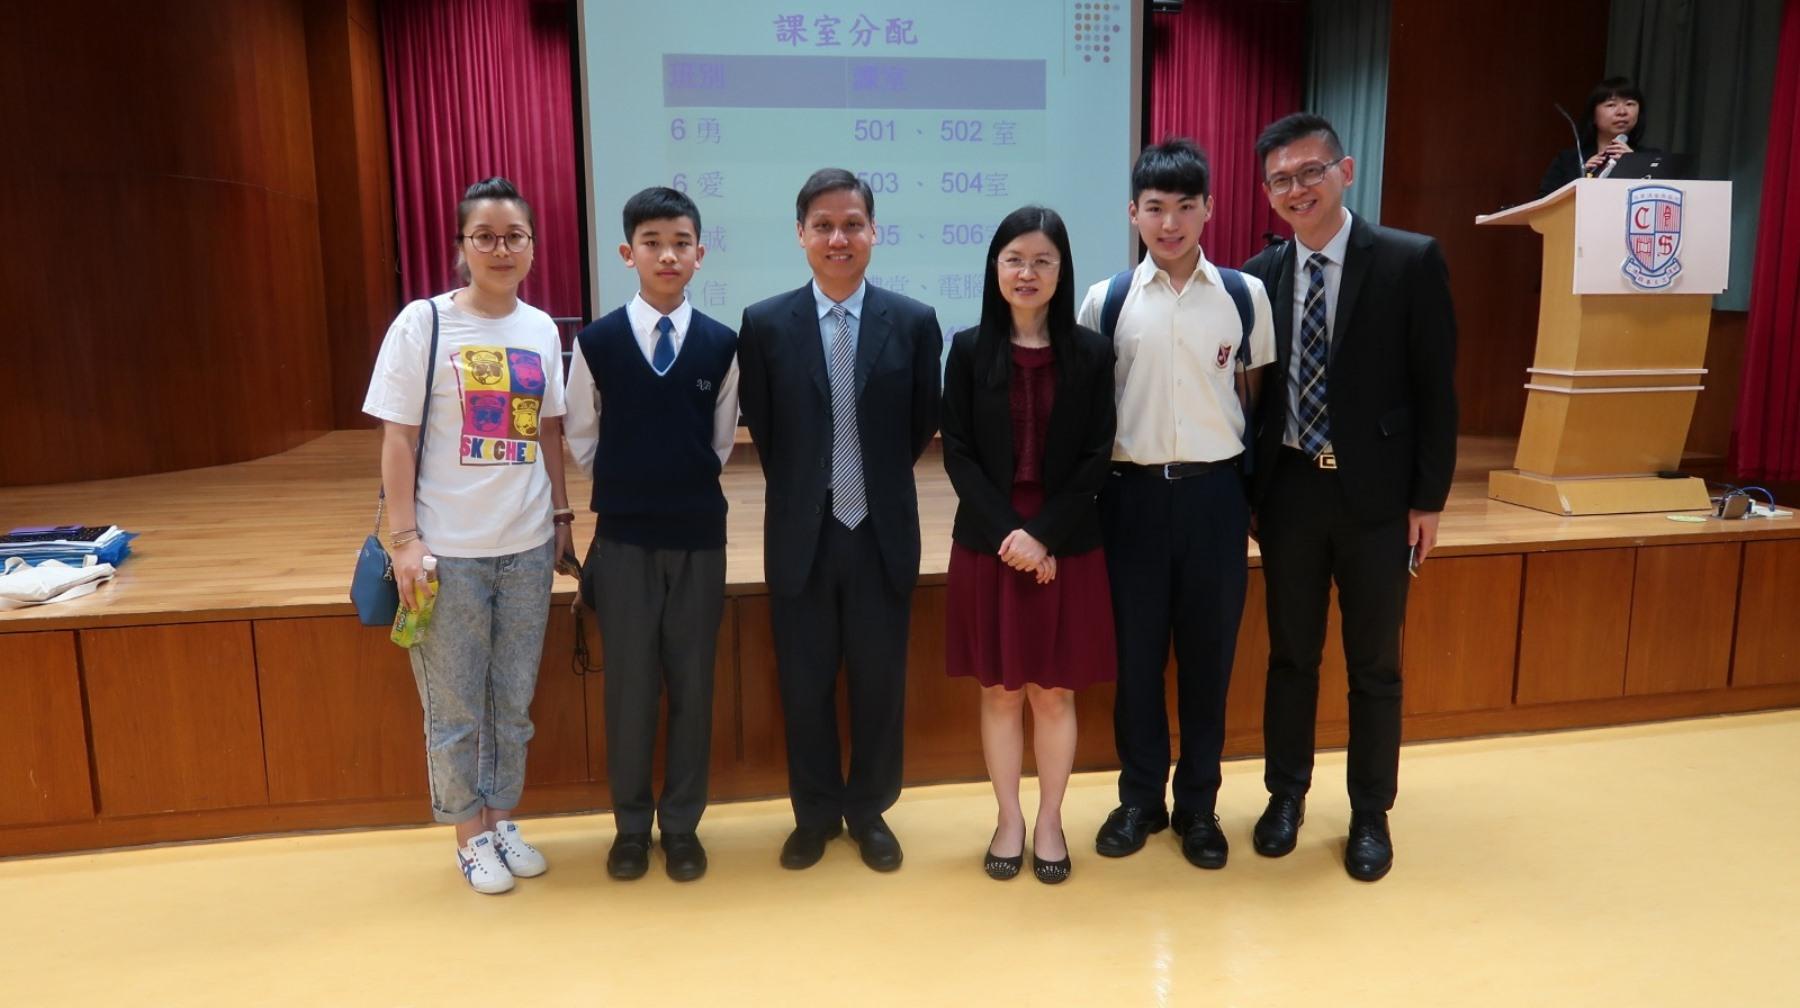 http://npc.edu.hk/sites/default/files/5_955.jpg